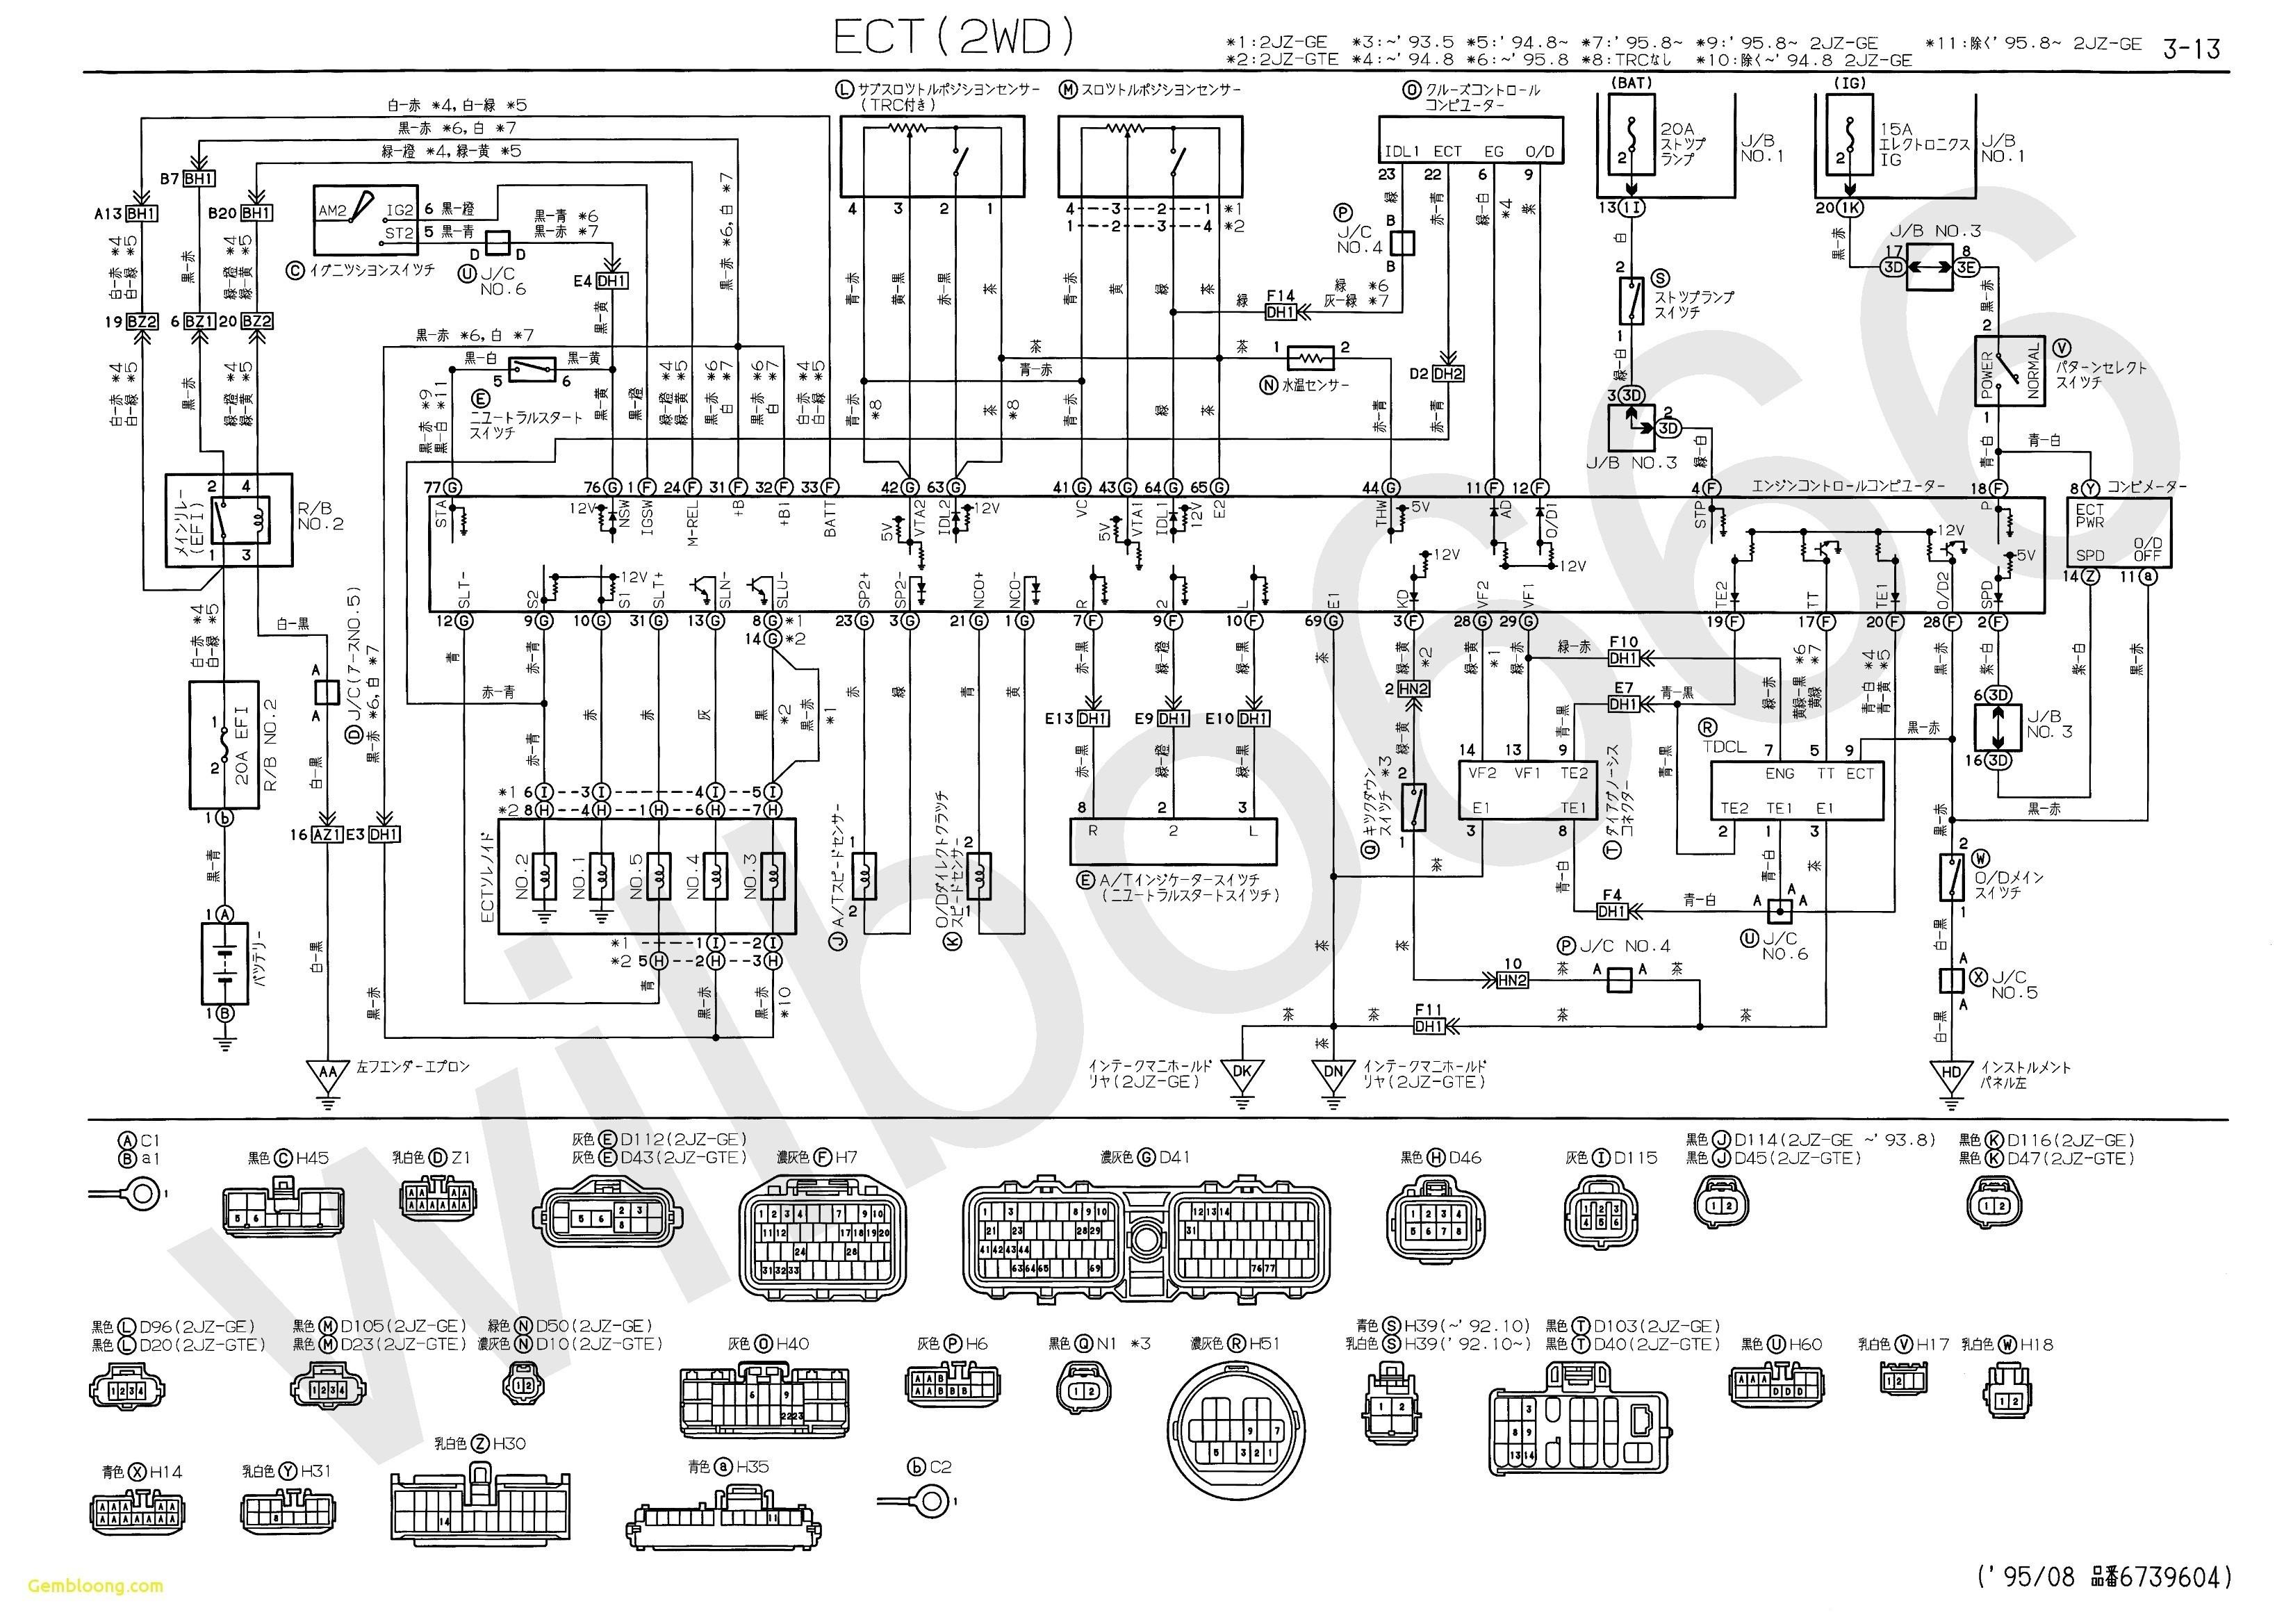 1993 toyota camry engine diagram 6 way trailer plug wiring ford my